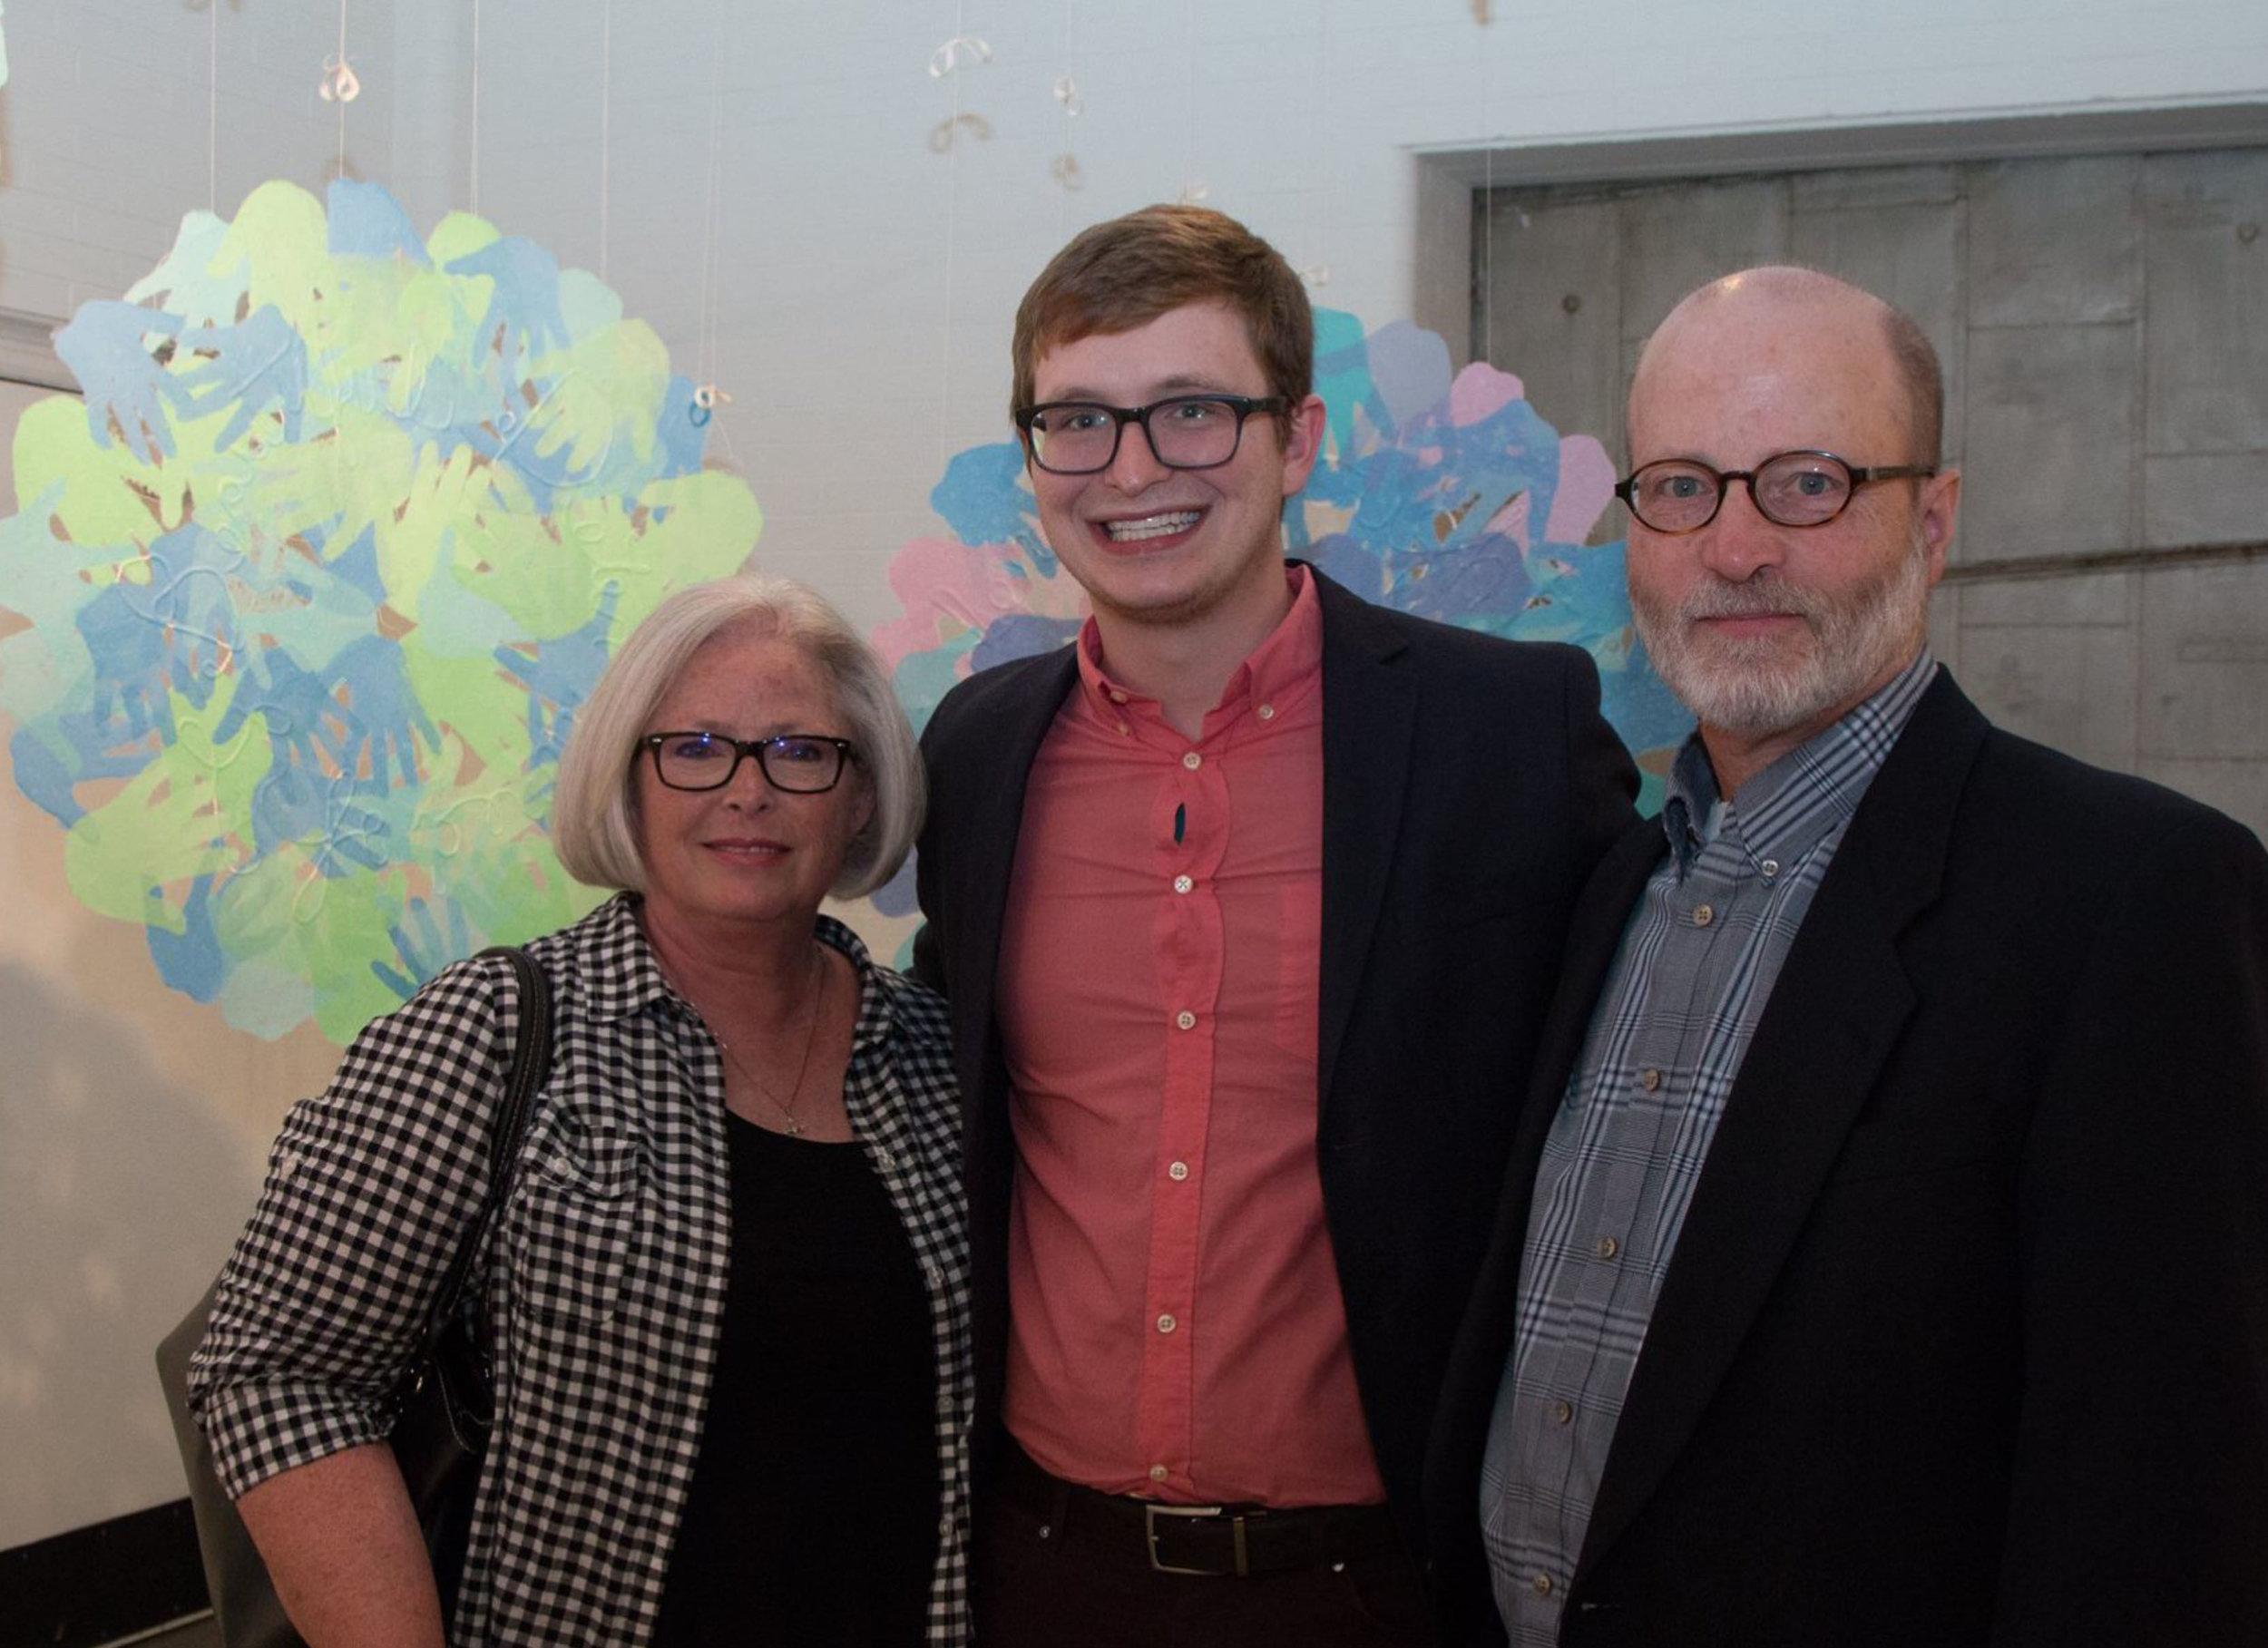 Micah Zavacky with Richard Finch and his wife. Photo courtesy: Justine Kaszynski Photography